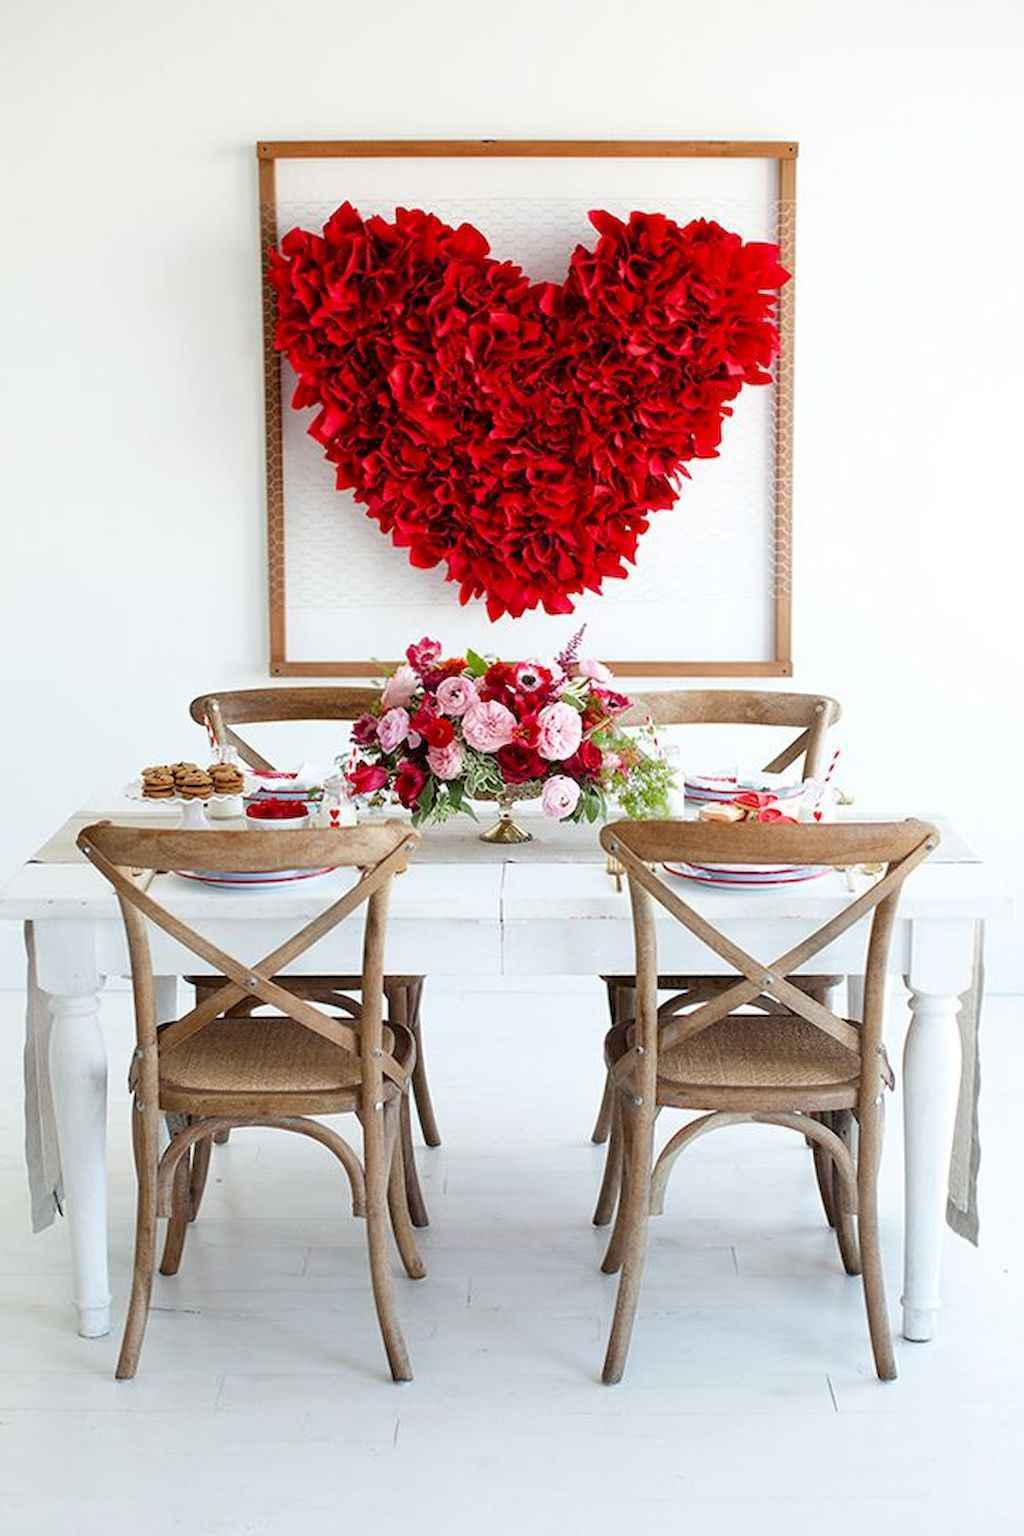 66 Romantic Valentines Table Settings Decor Ideas (27)